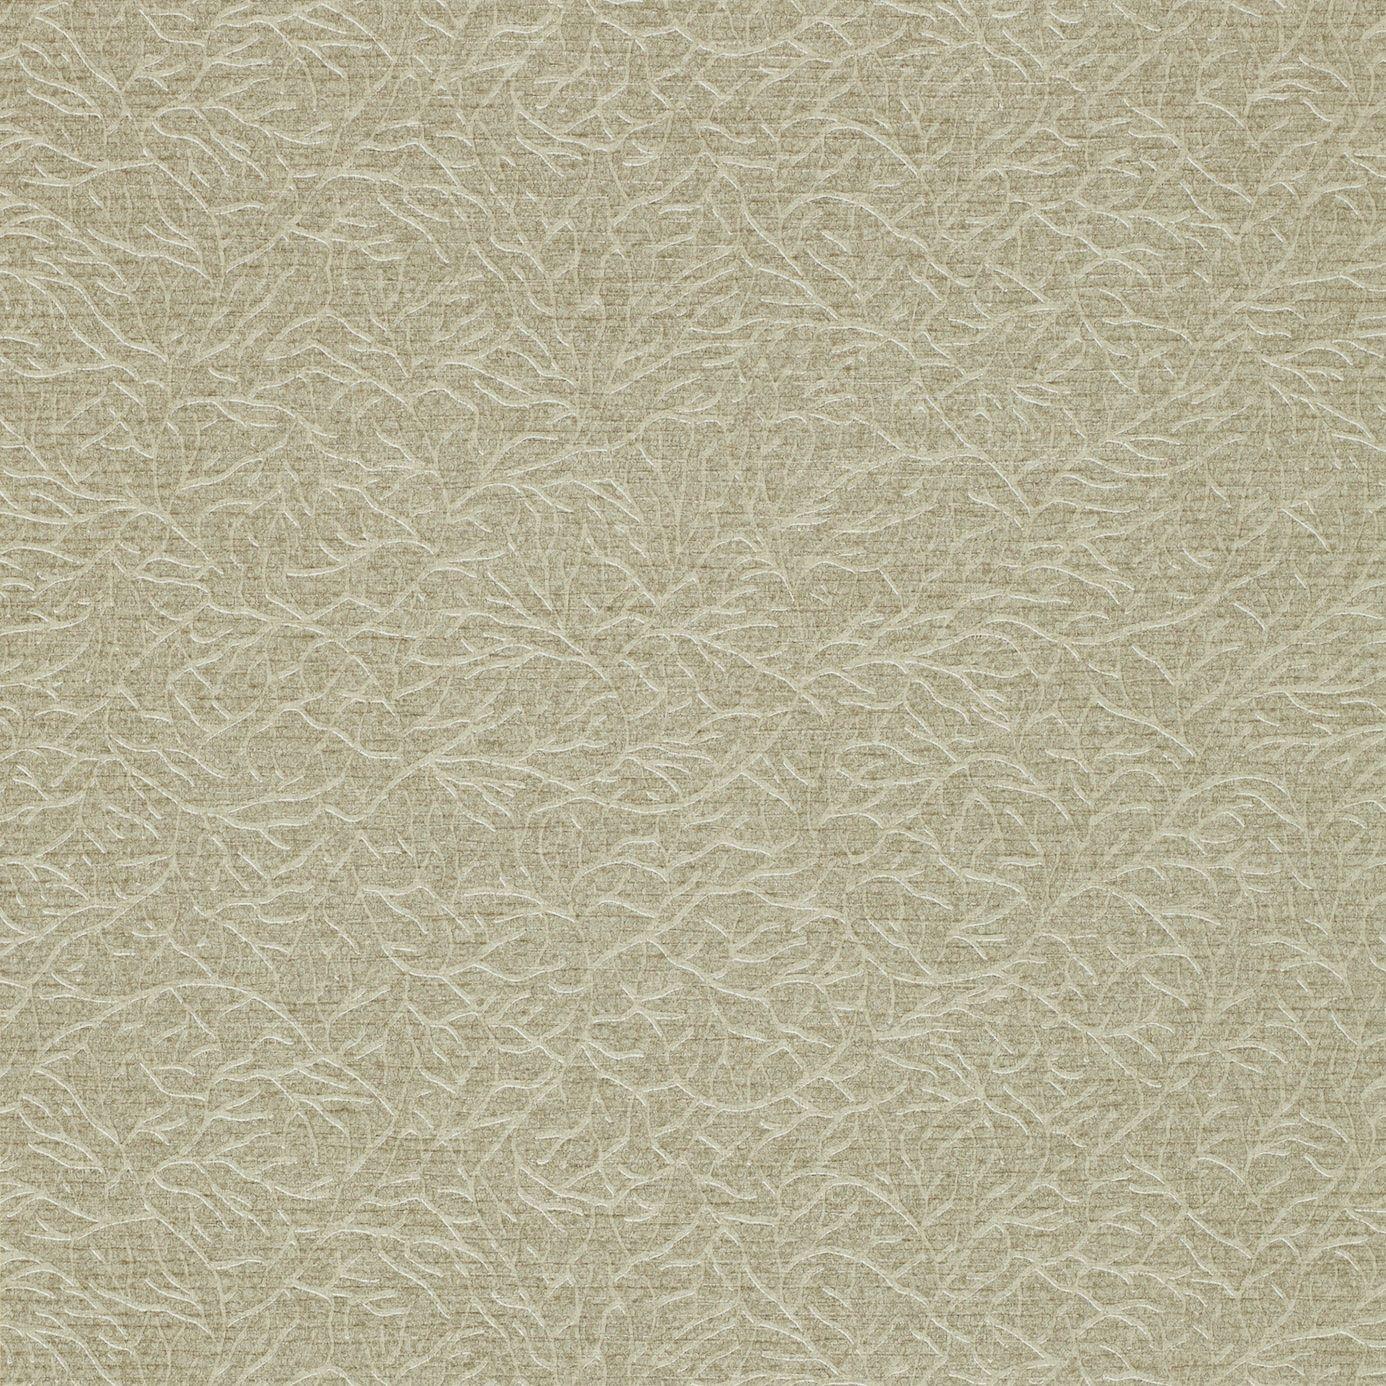 Papel pintado zoffany ribbon coral 312128 disponible - Papel pintado exclusivo ...